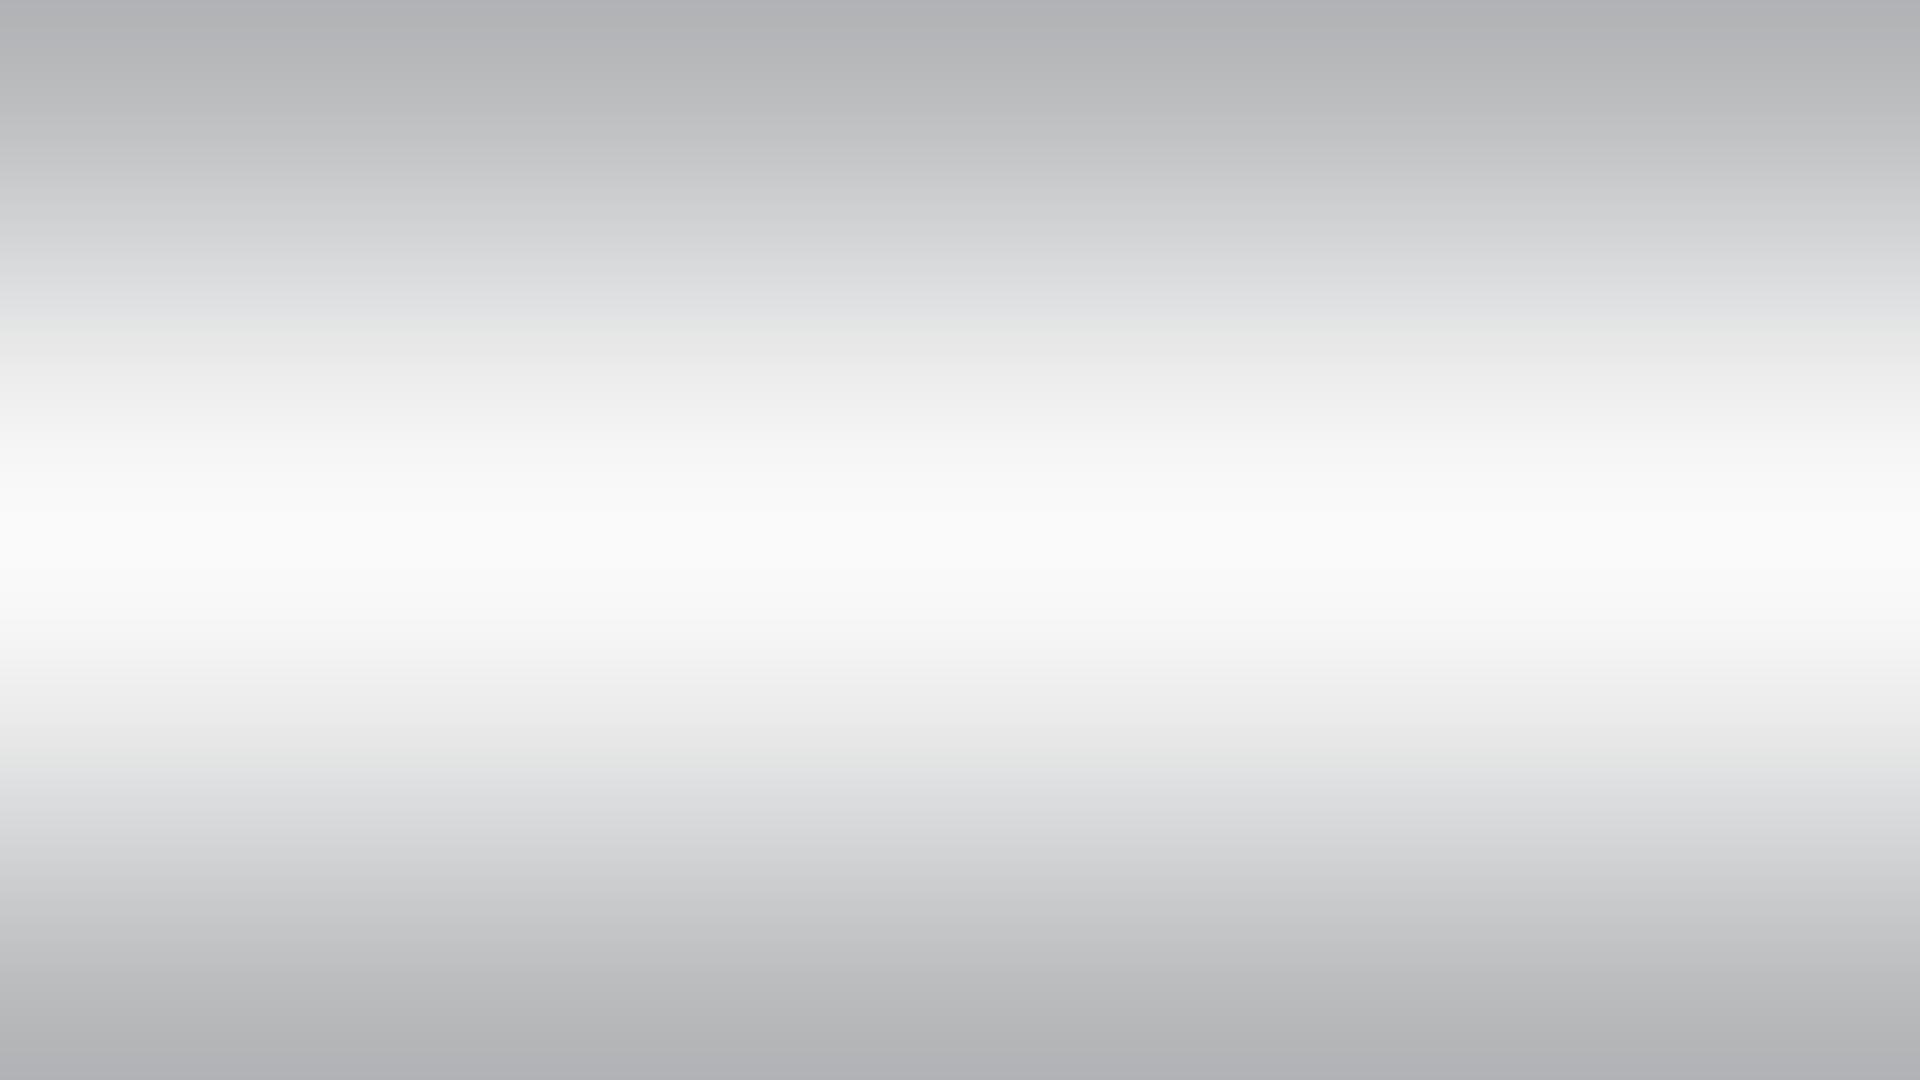 Silver Hd Wallpaper: Silver Desktop Backgrounds